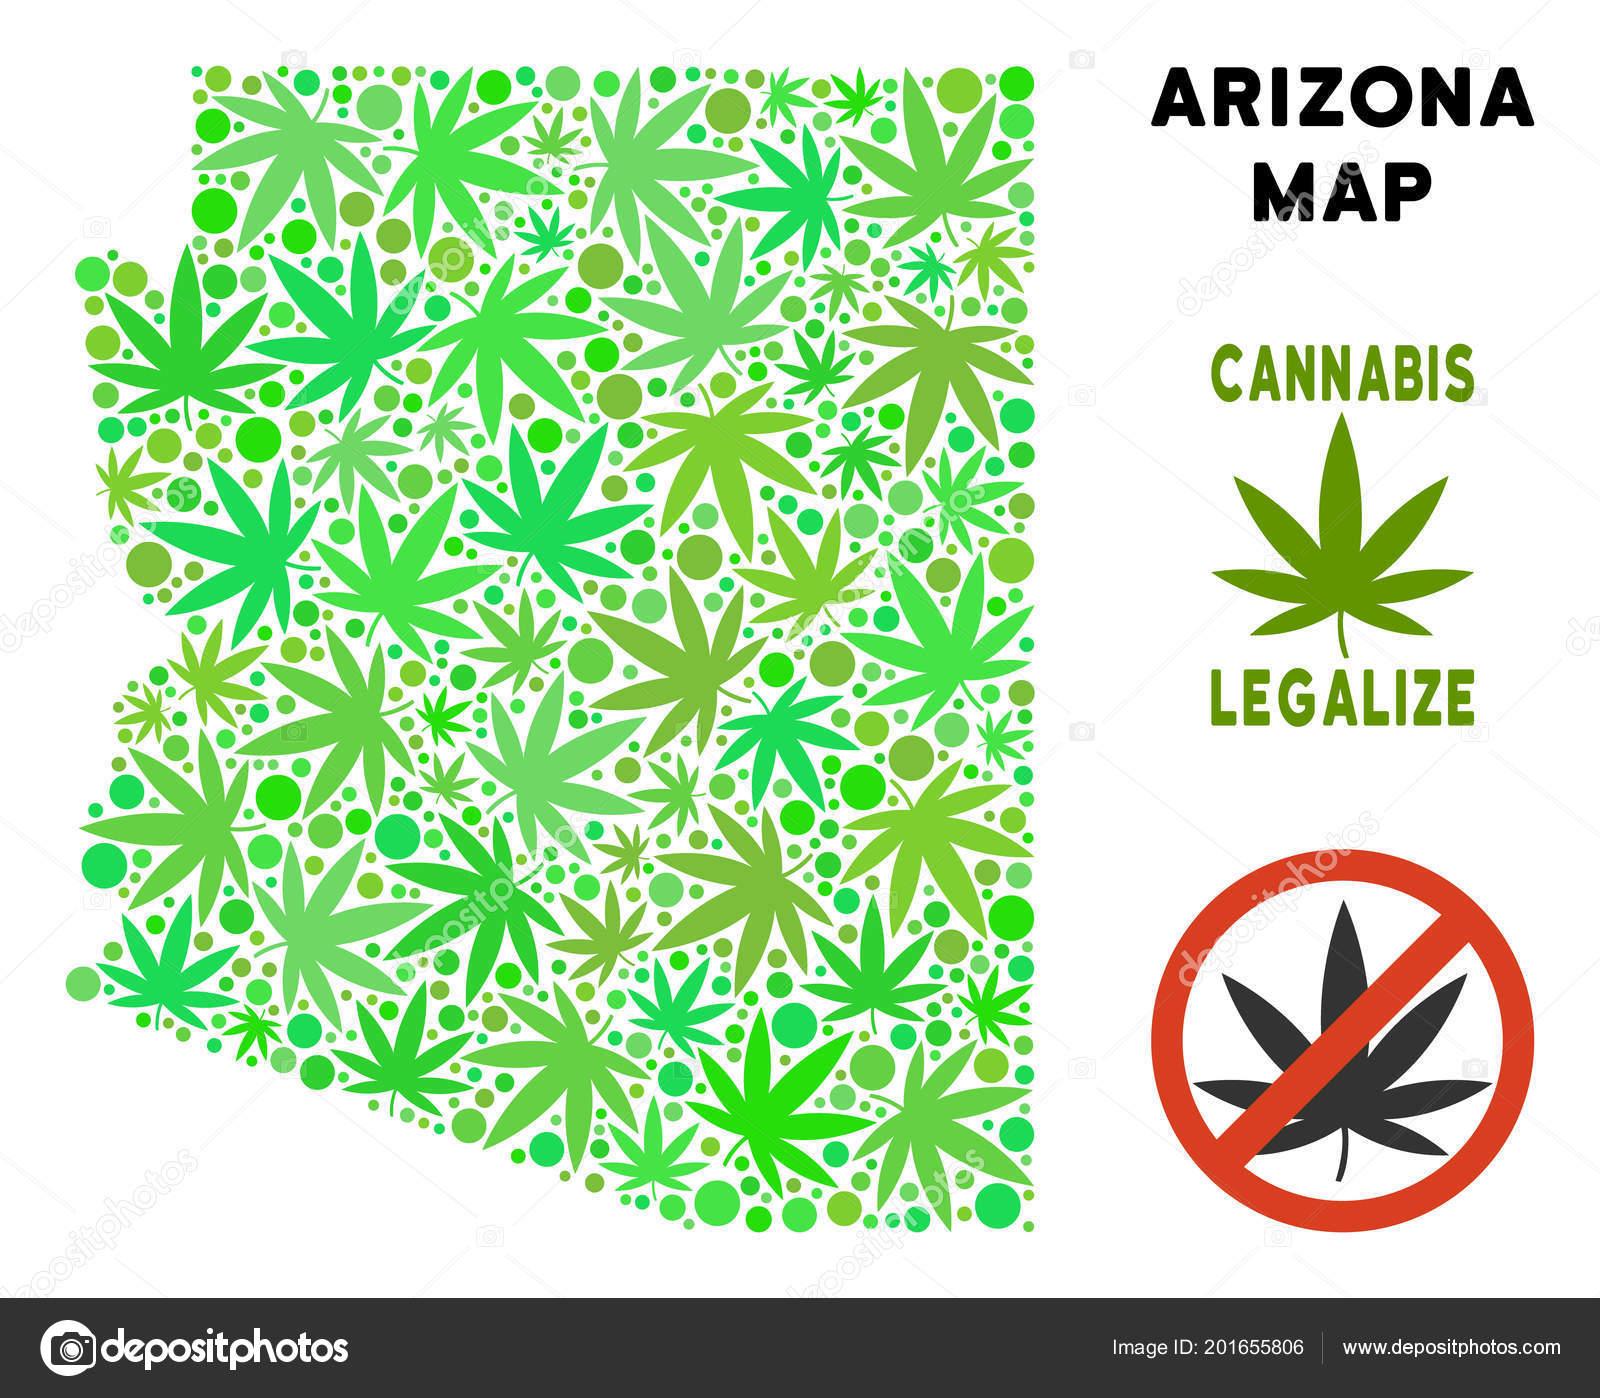 Arizona State Map Free.Royalty Free Marijuana Leaves Style Arizona State Map Stock Vector